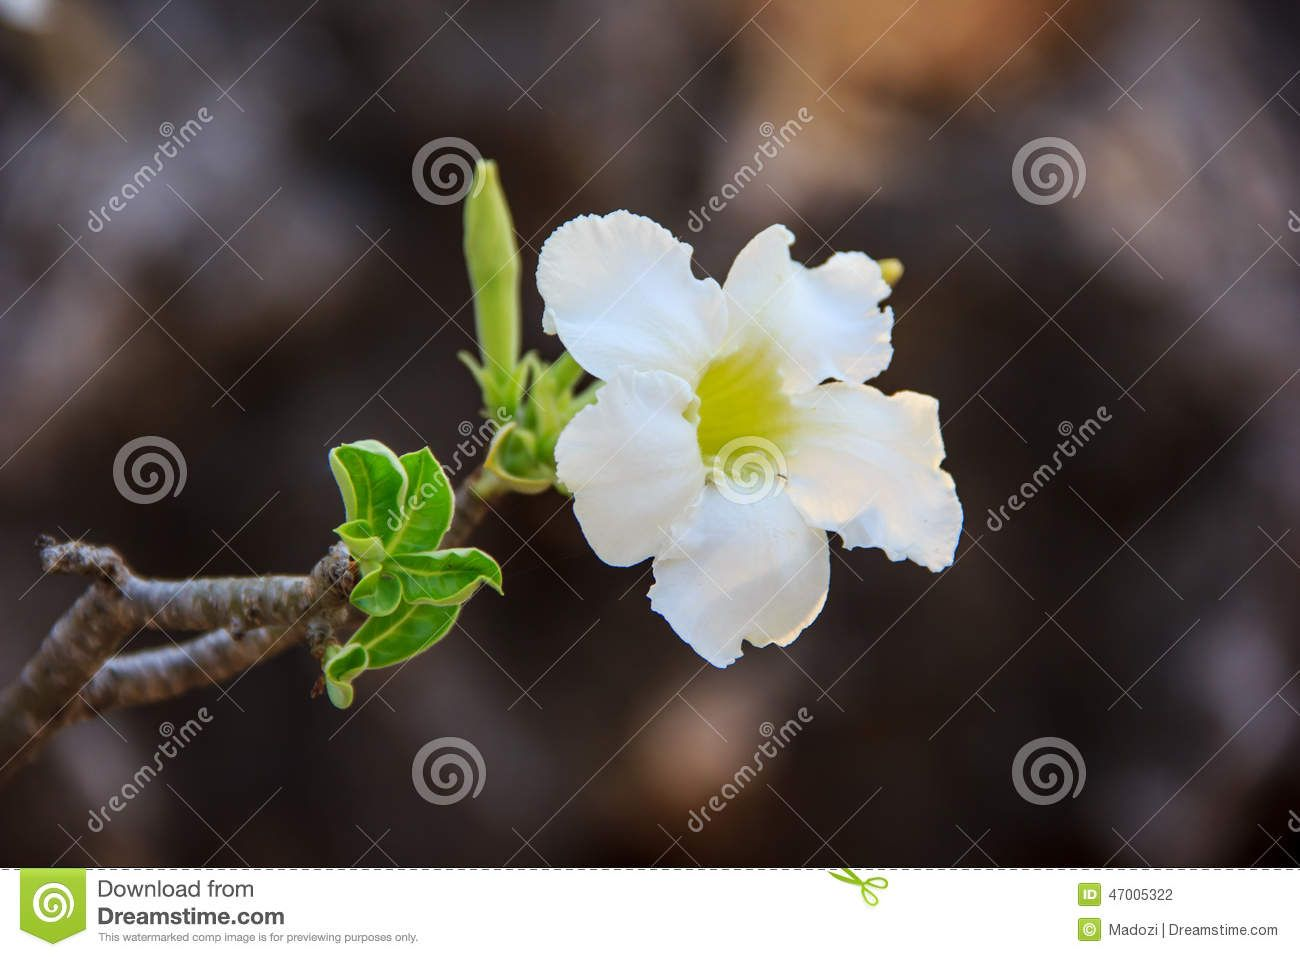 Image from http://thumbs.dreamstime.com/z/white-adenium-obesum-flower-closeup-47005322.jpg.